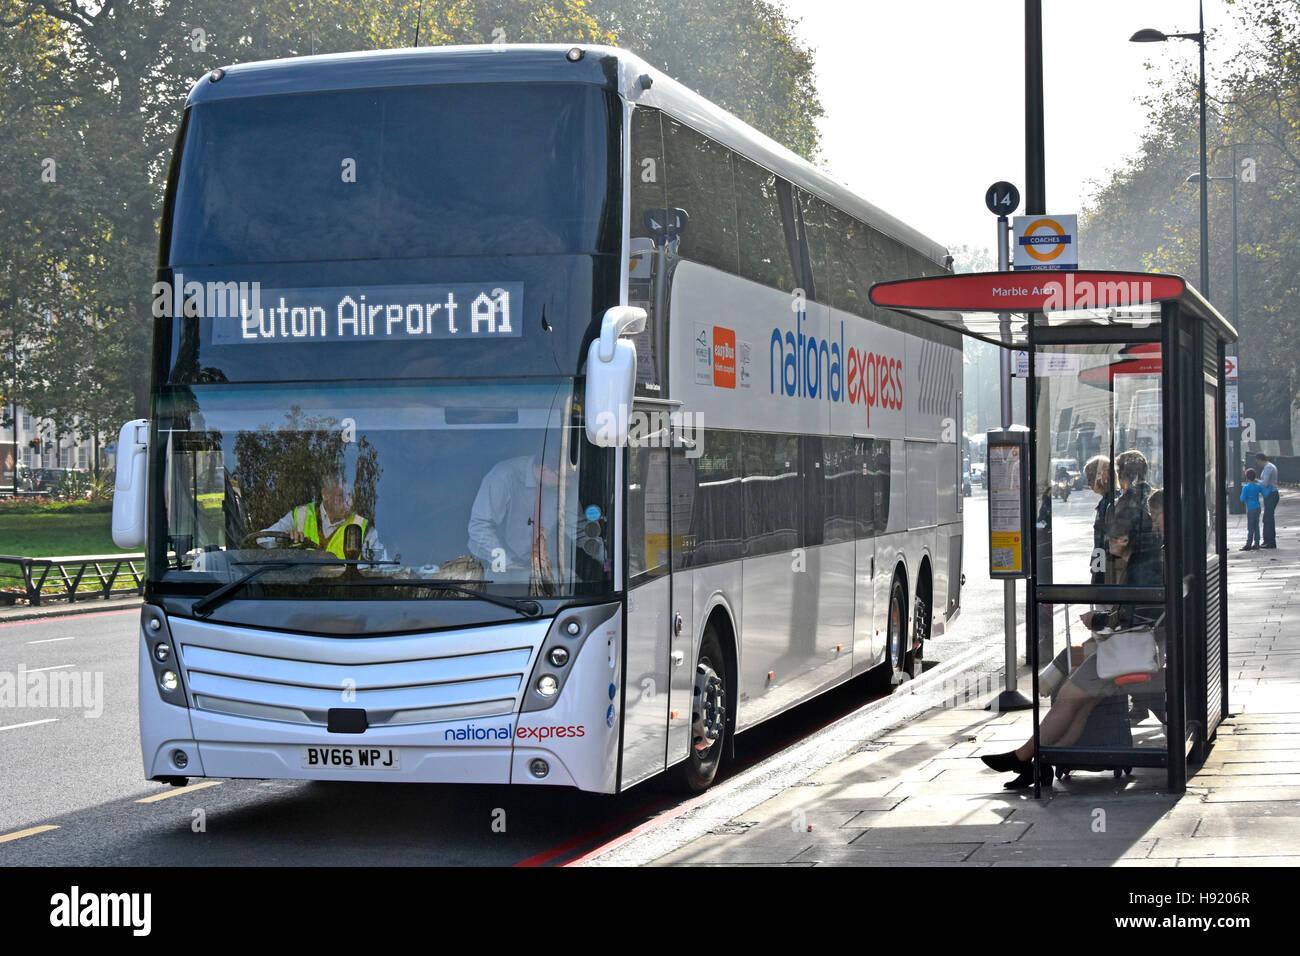 National Express Public Transport Double Decker Coach Bus